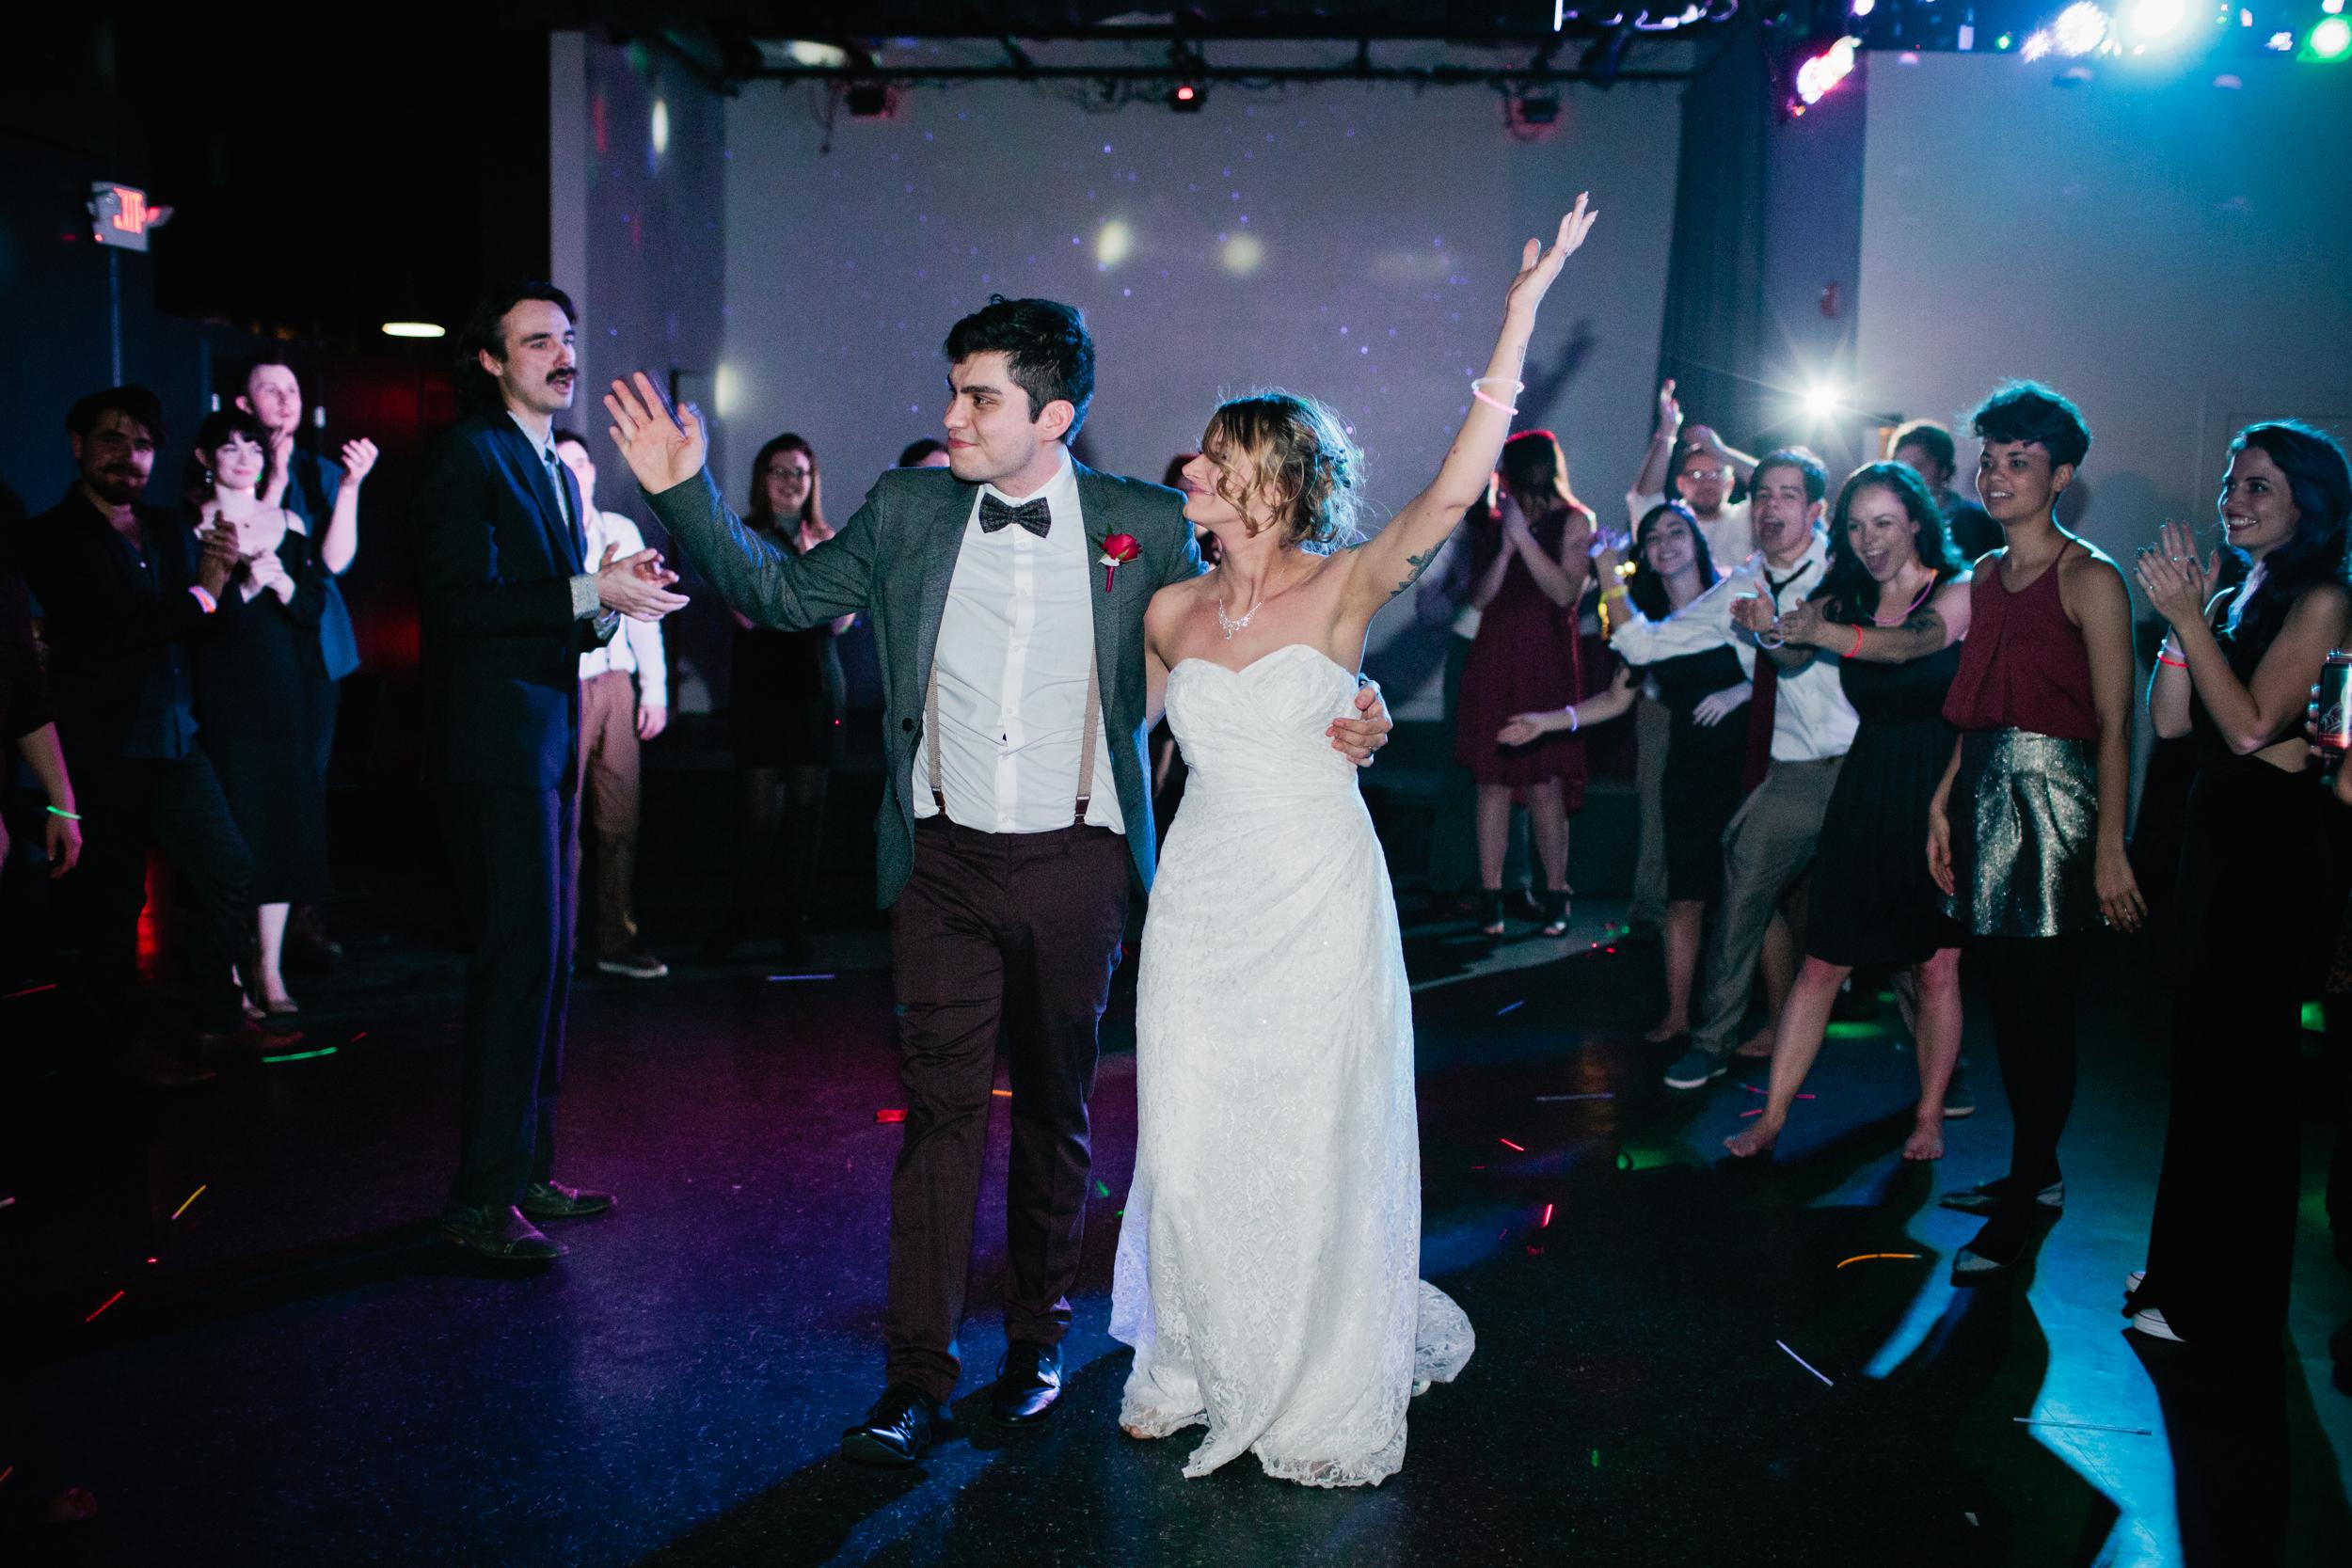 providence-wedding-photographer-181.jpg